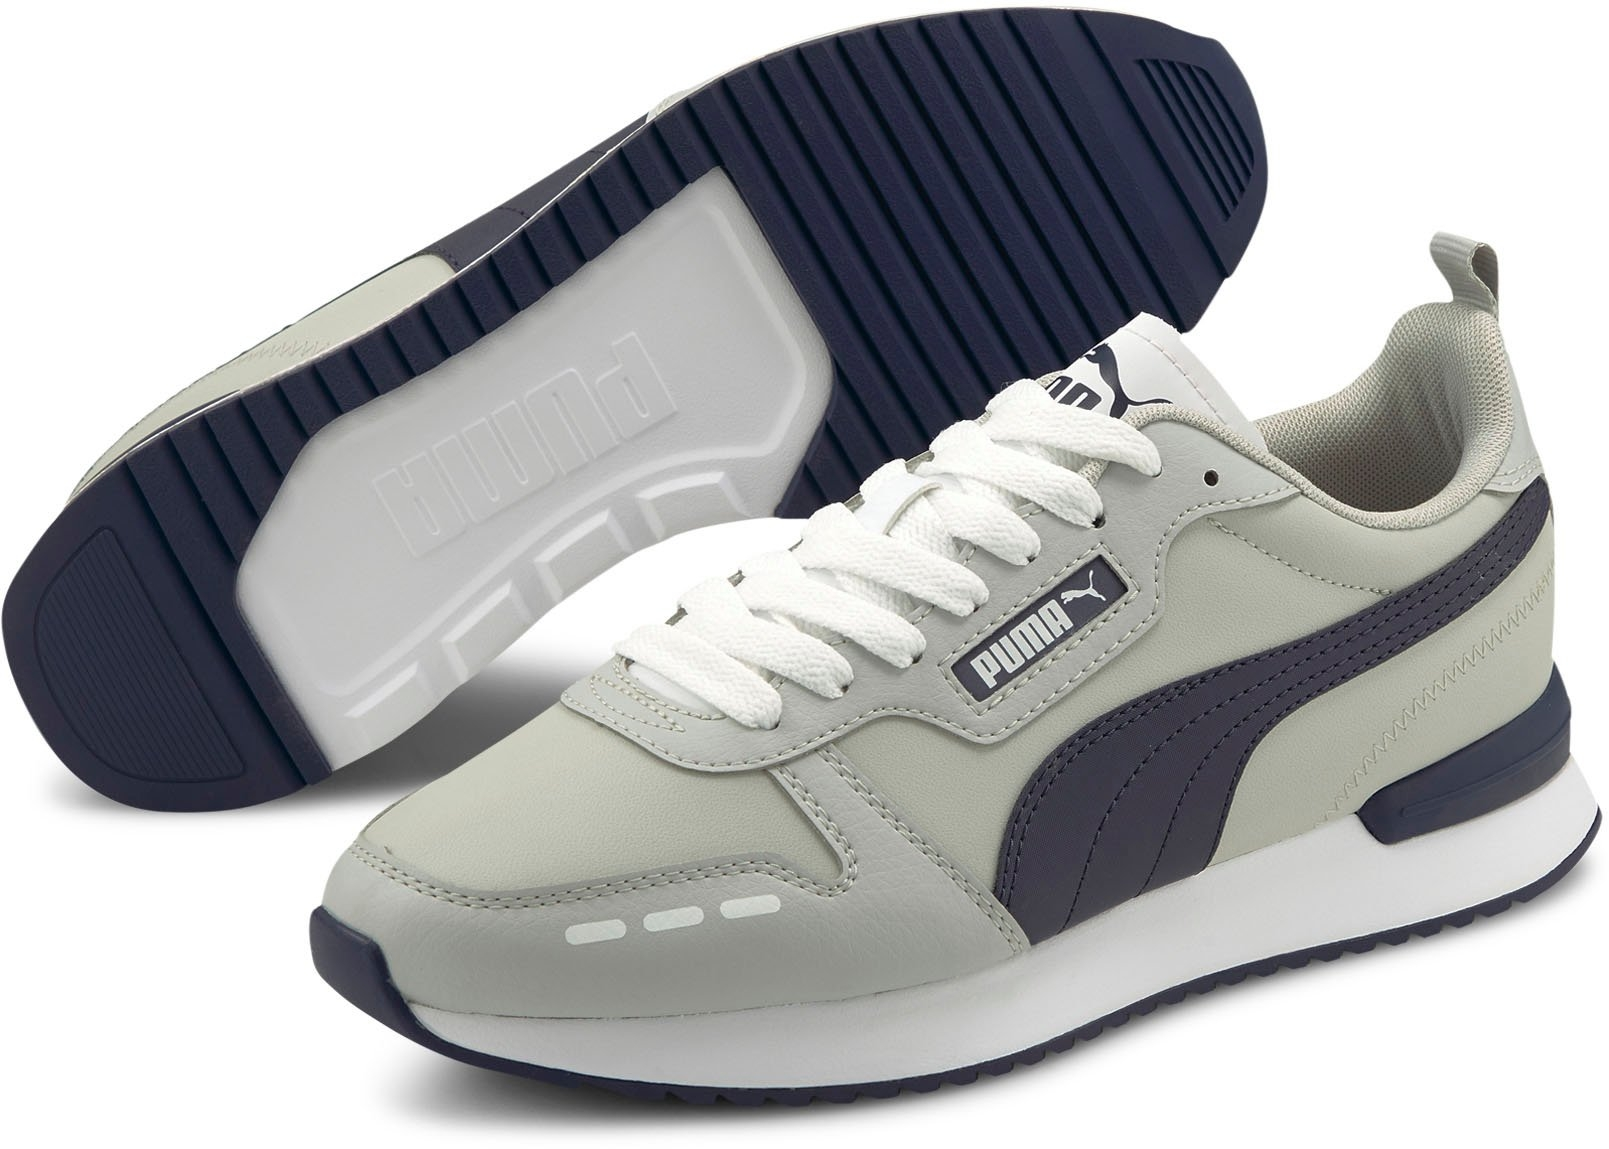 PUMA sneakers PUMA R78 SL goedkoop op otto.nl kopen